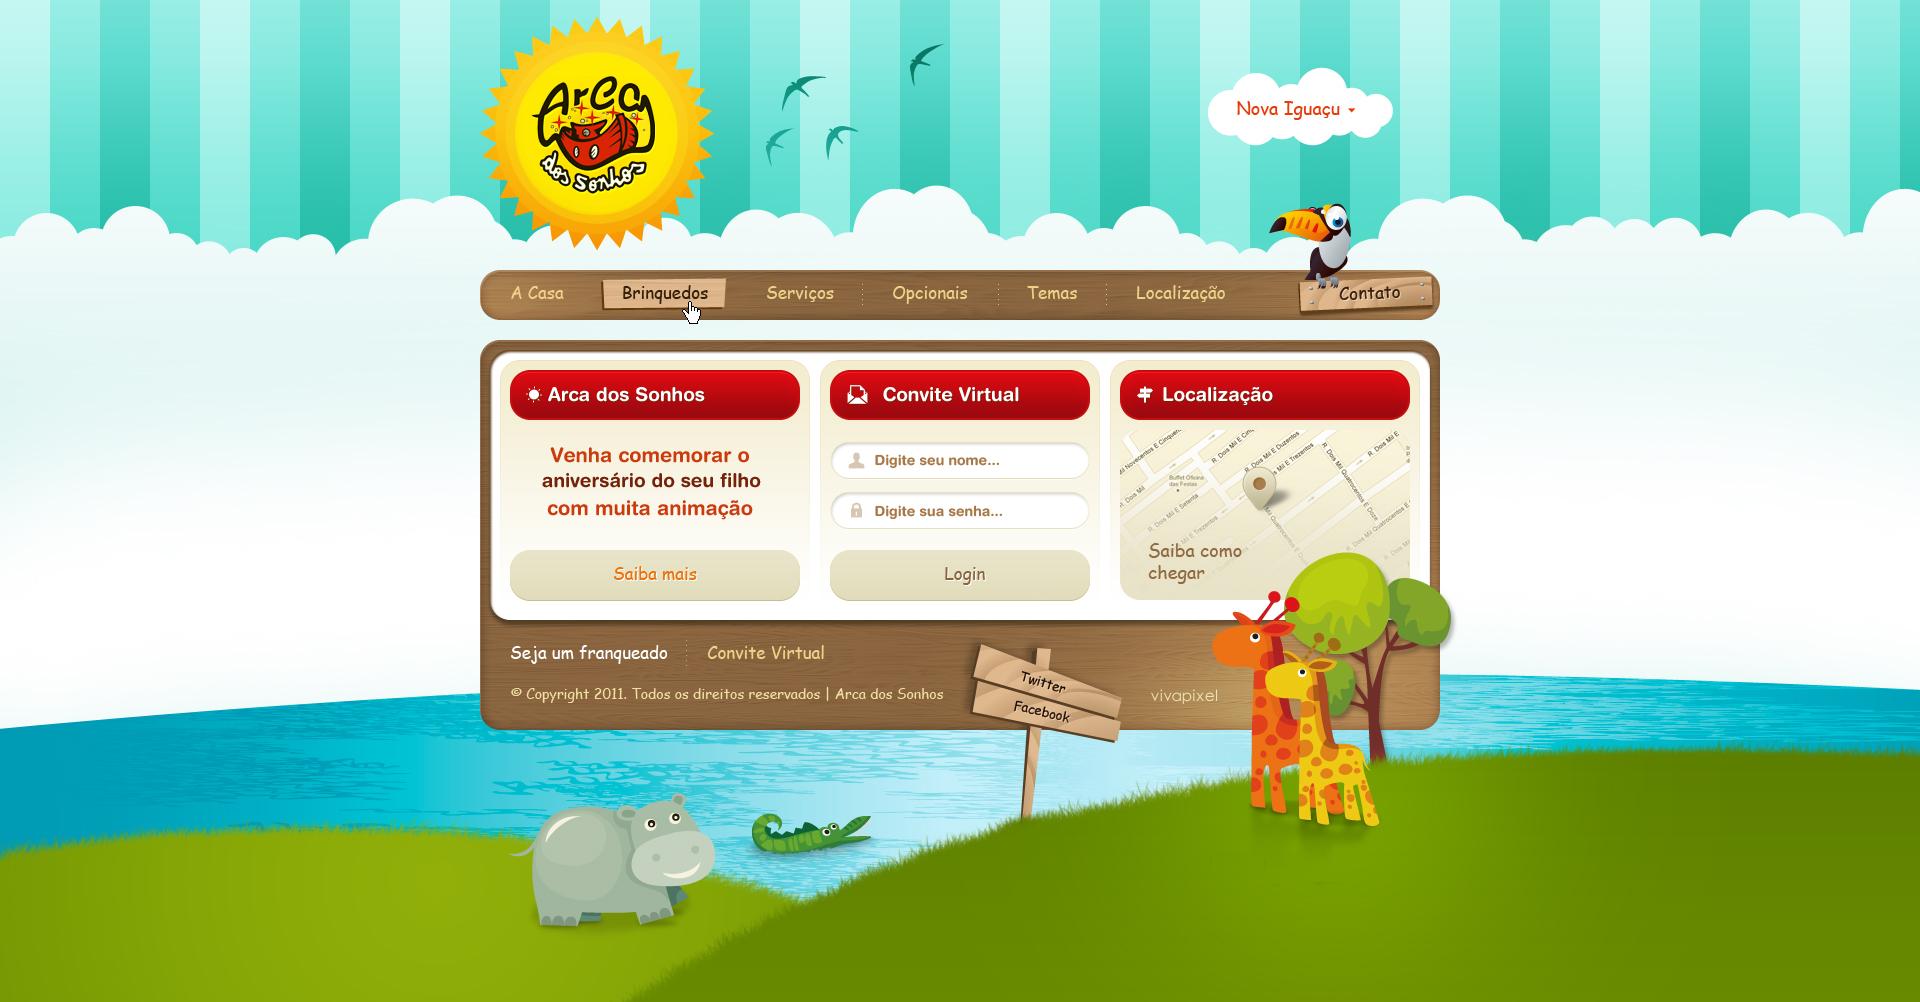 Arca dos Sonhos by nfxdesign